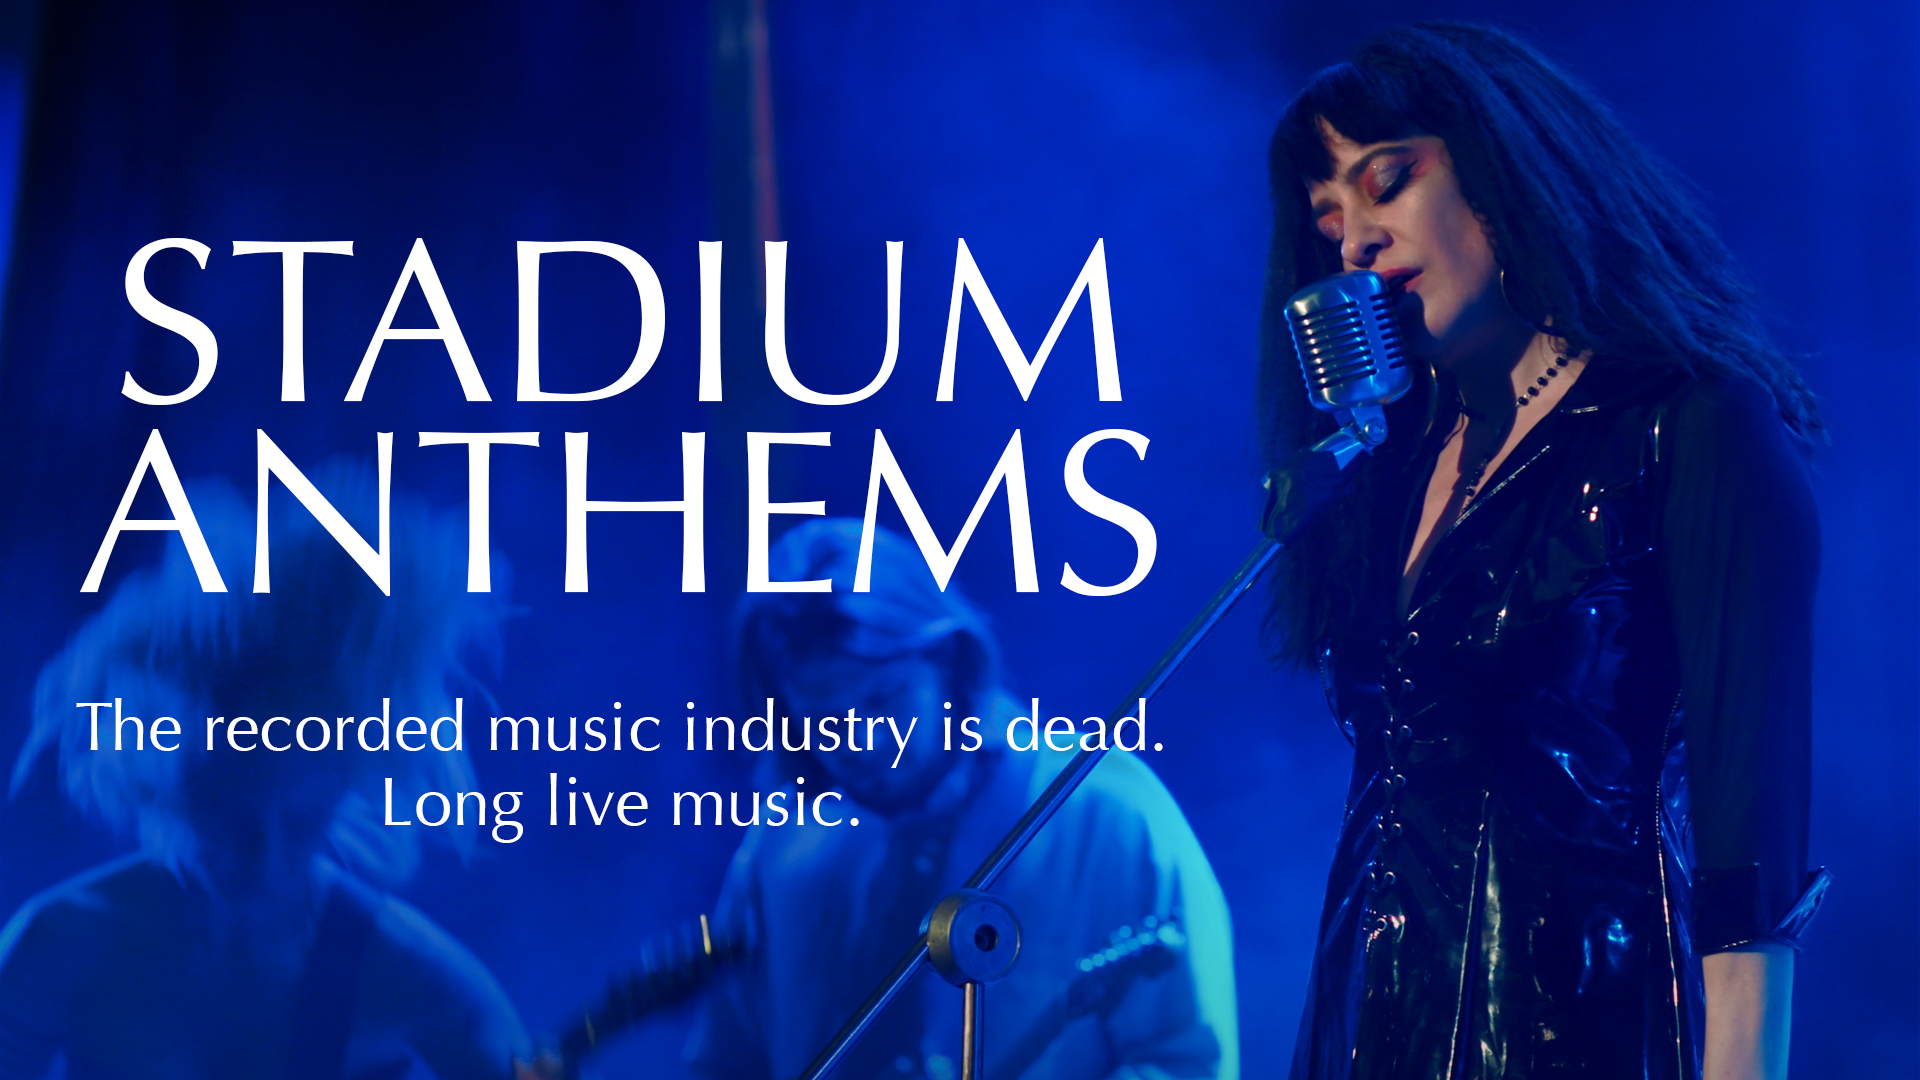 Stadium Anthems